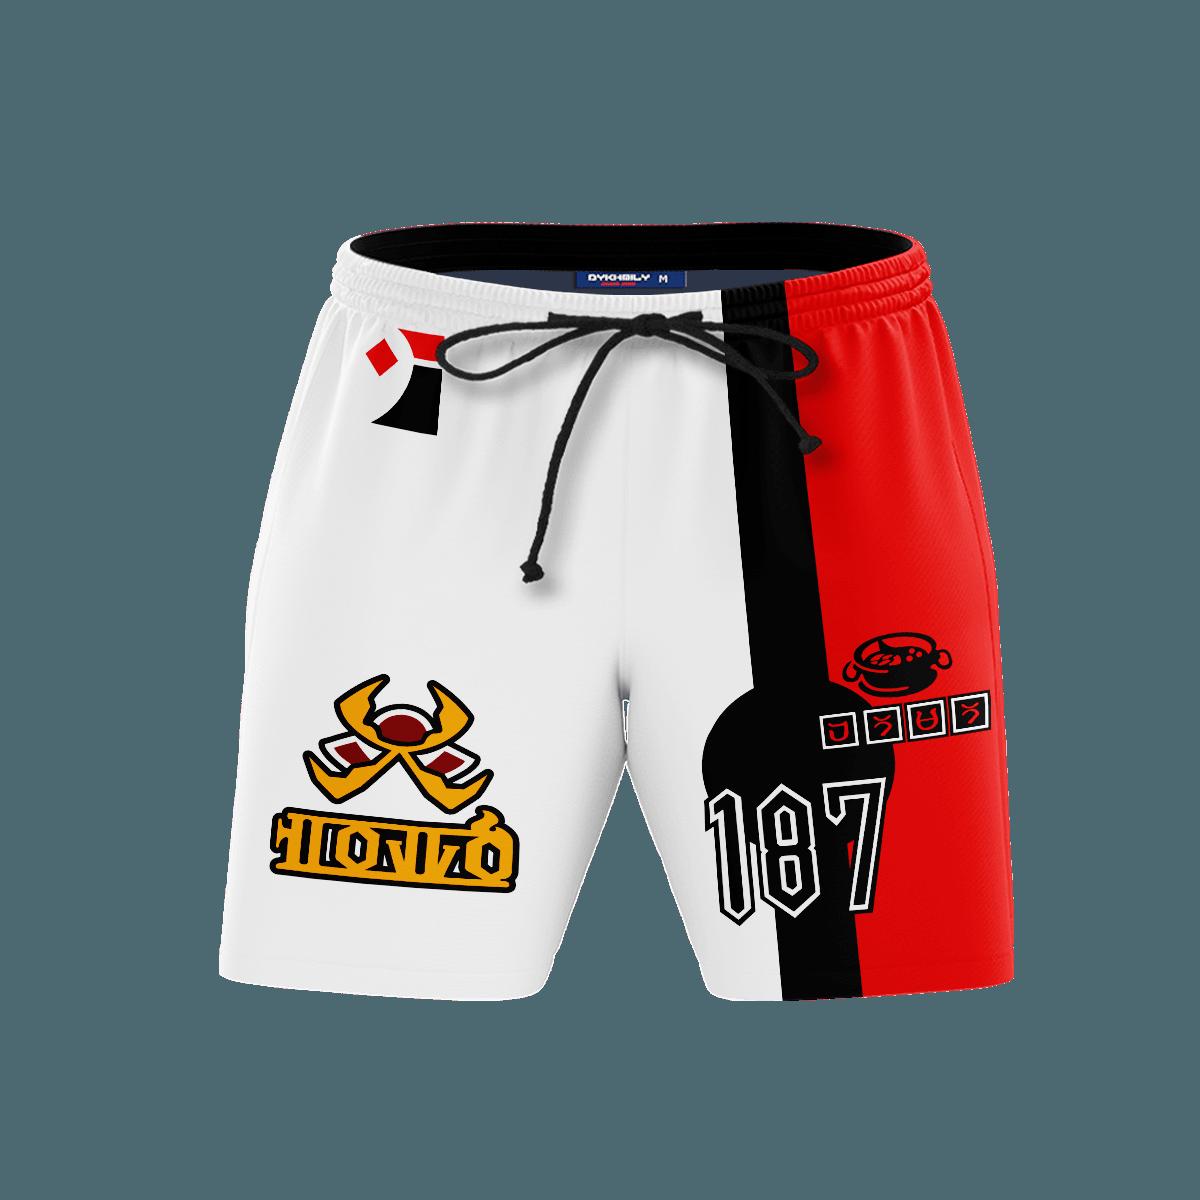 Pokemon Fire Uniform Beach Shorts FDM3107 S Official Anime Swimsuit Merch